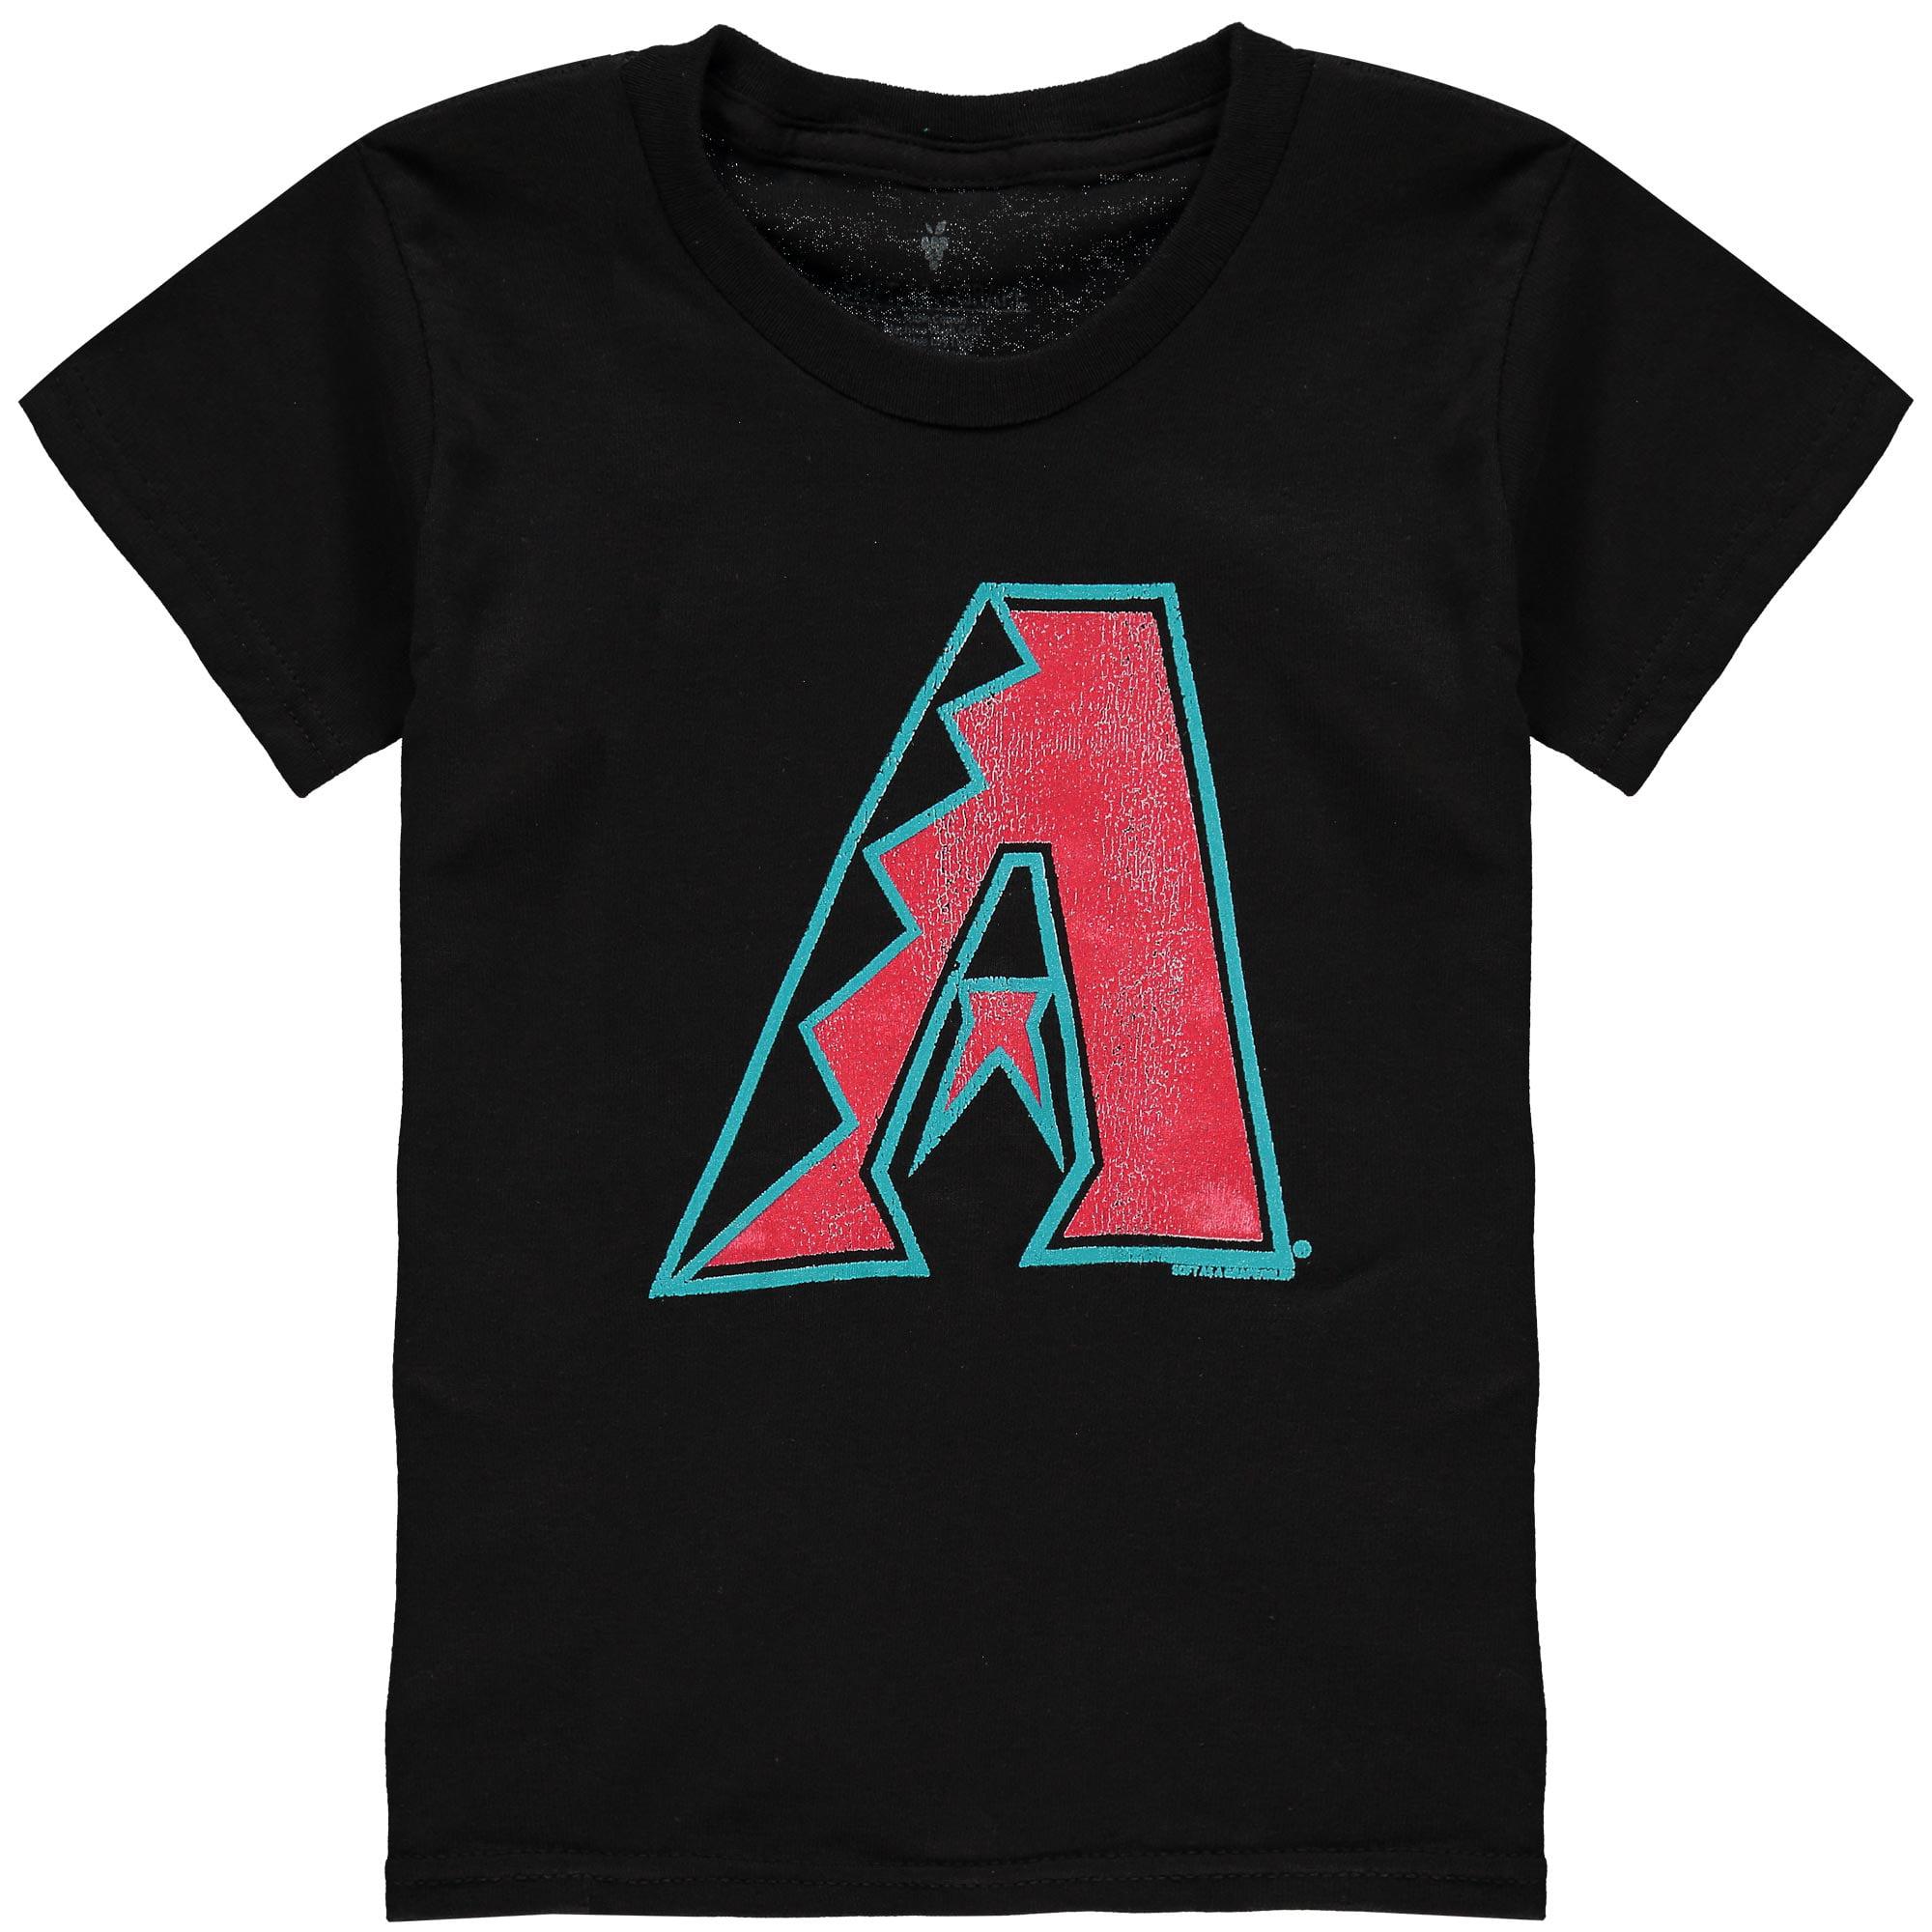 Arizona Diamondbacks Soft as a Grape Youth Distressed New Logo T-Shirt - Black